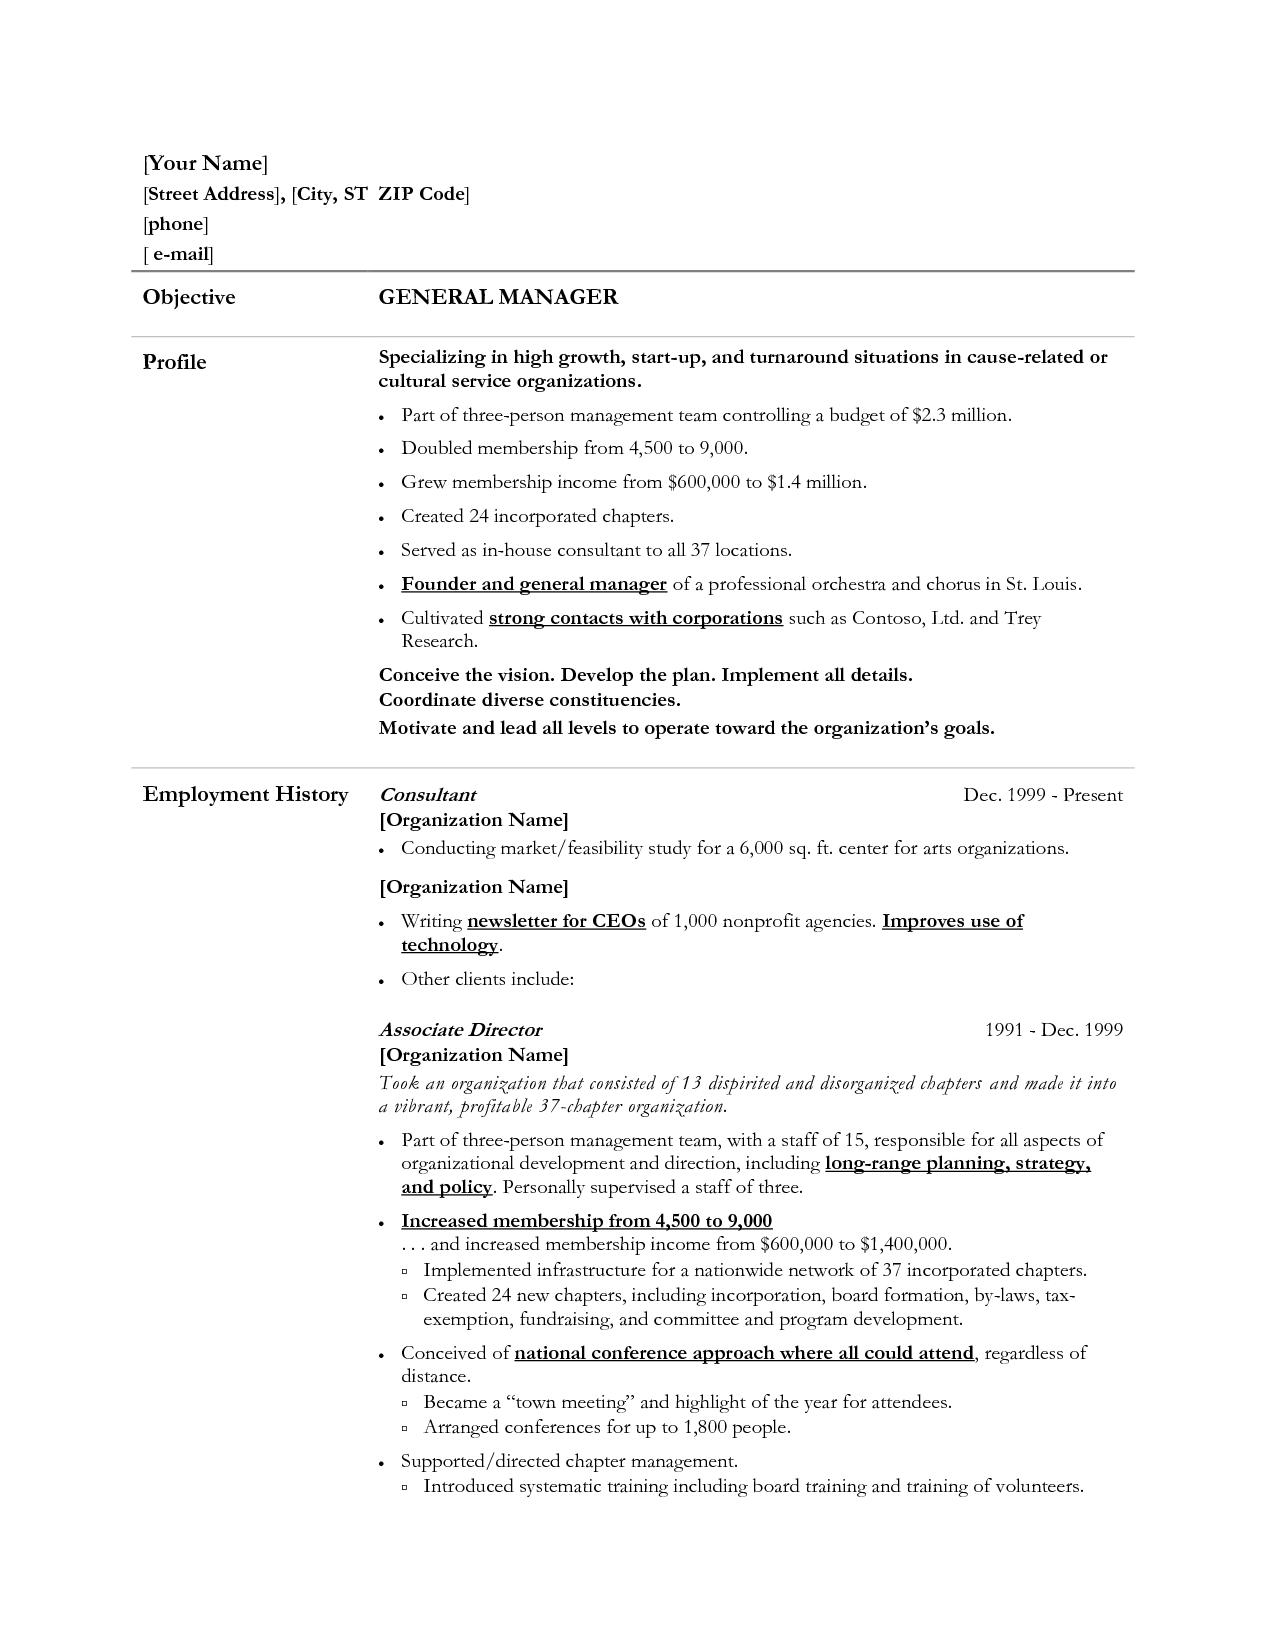 General Manager Resume Example Resumecareer Info